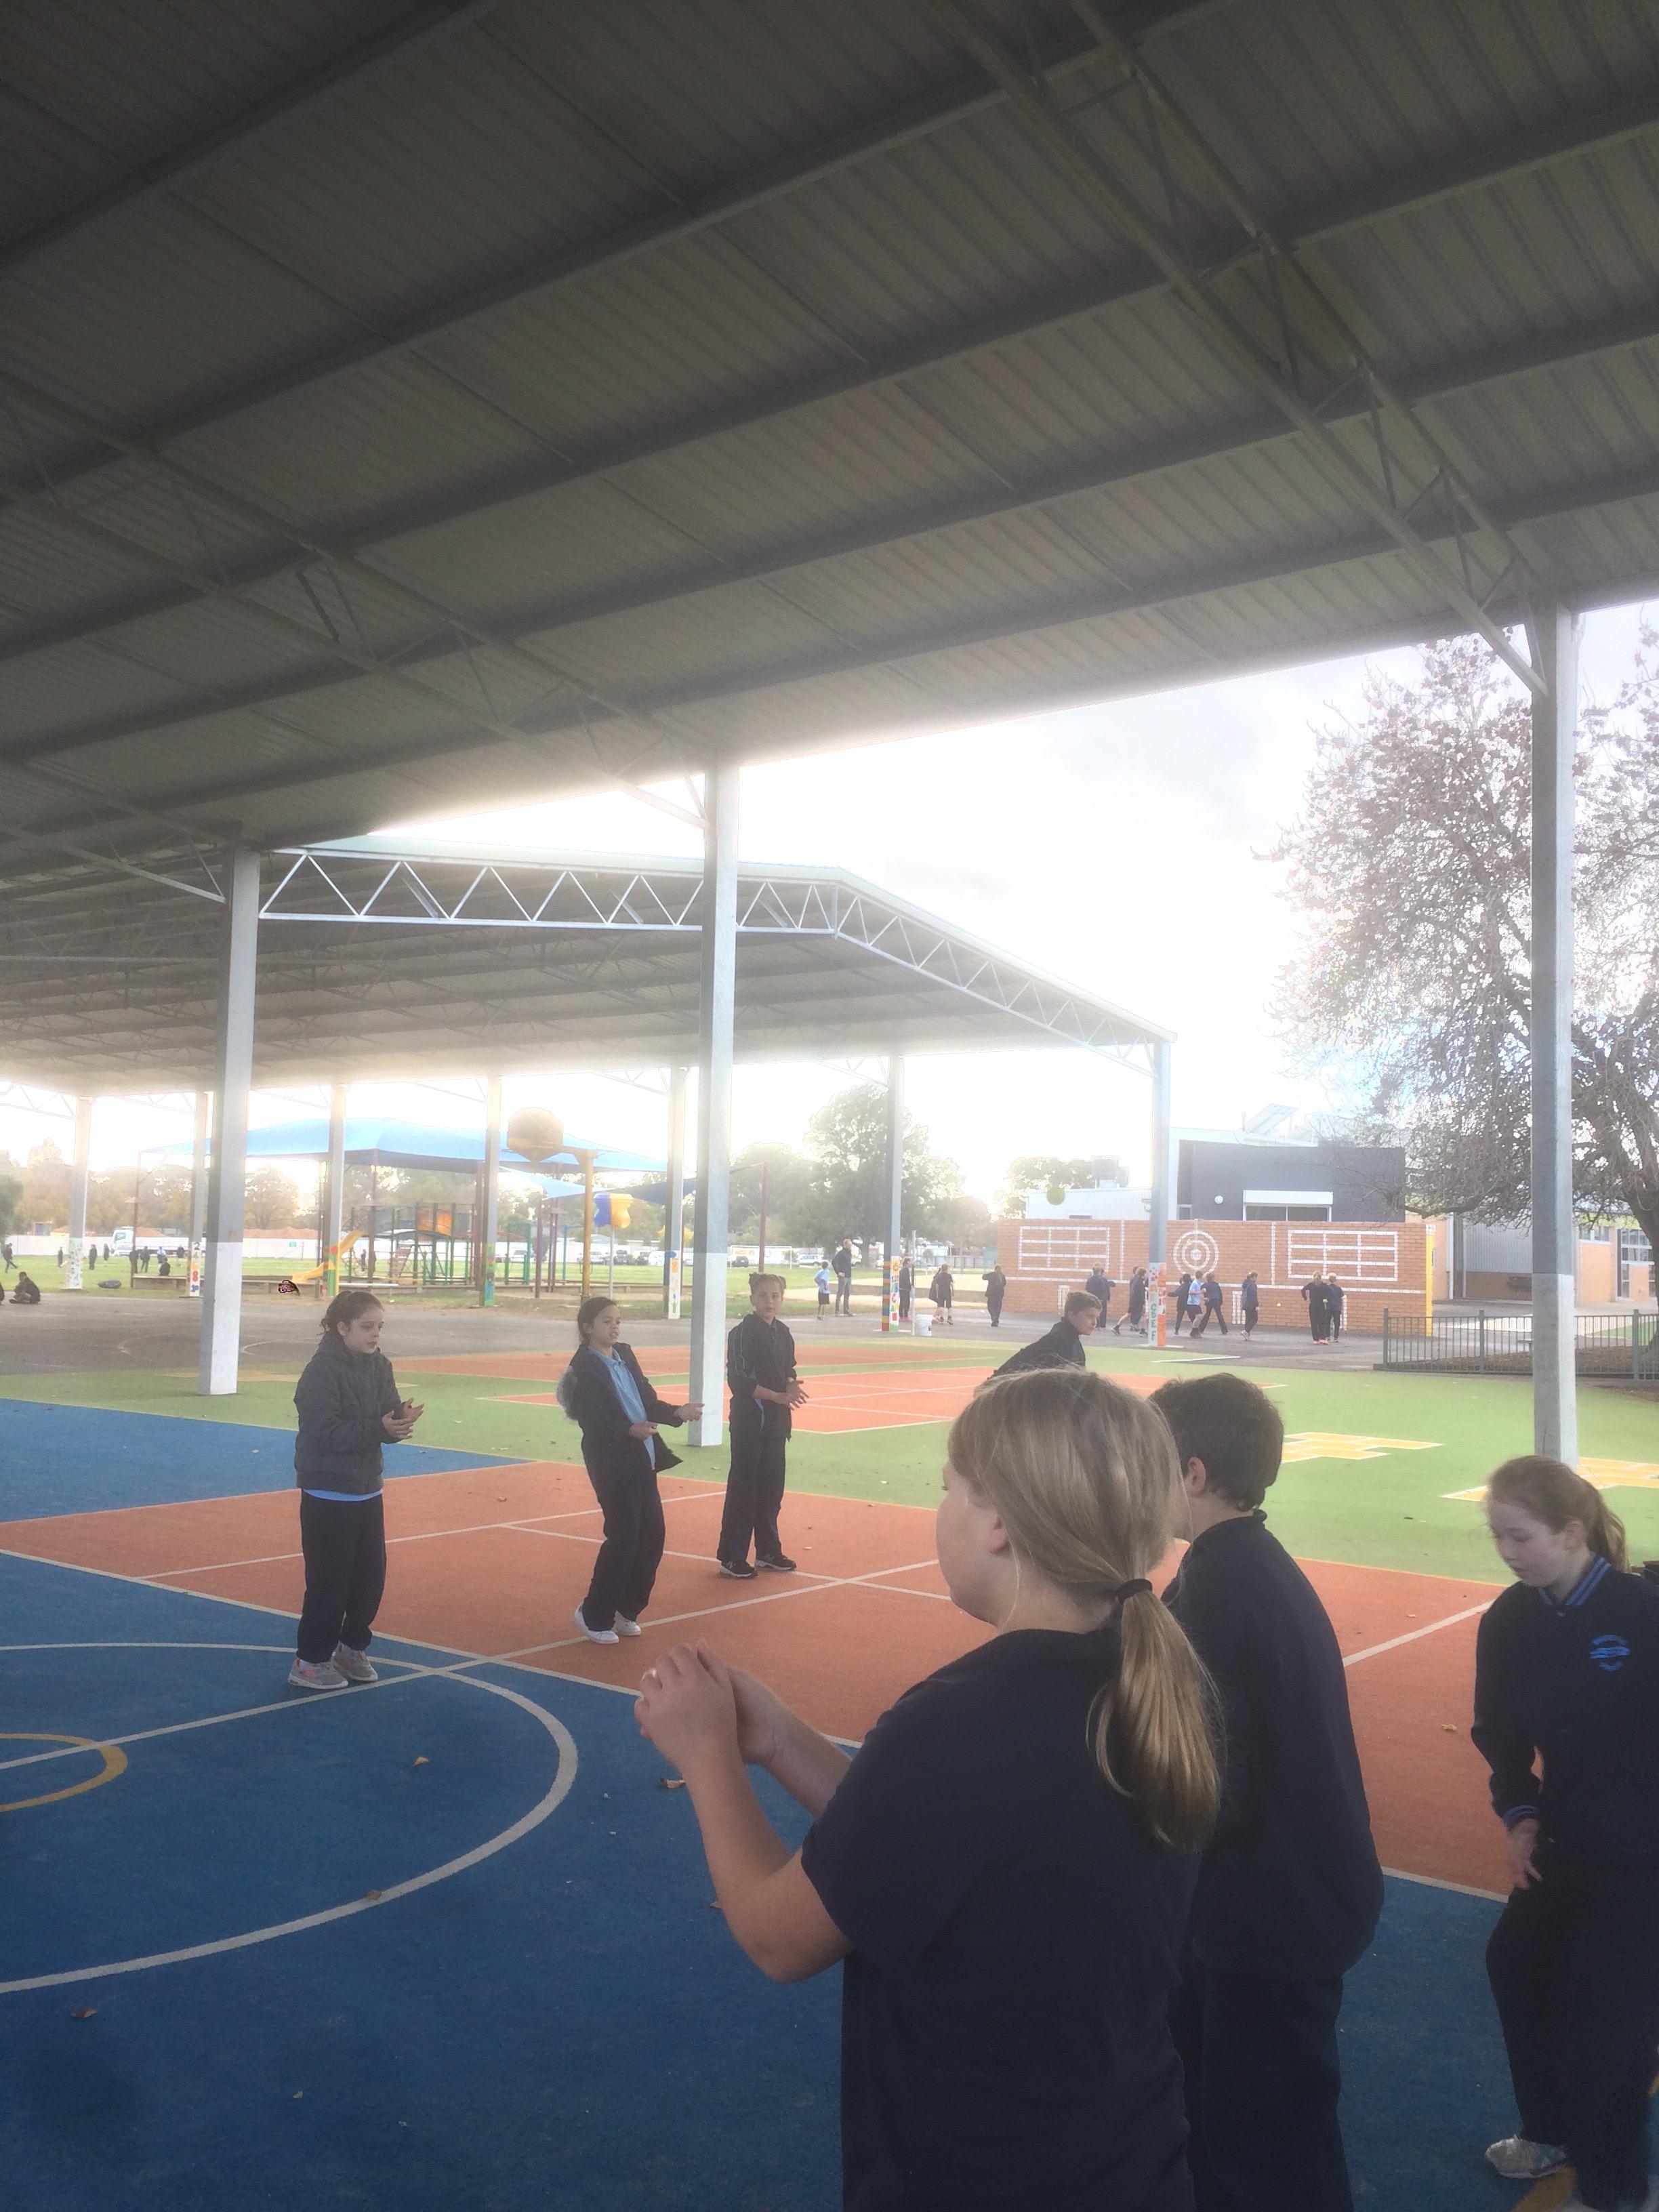 Downball is a popular Grade 4 activity!